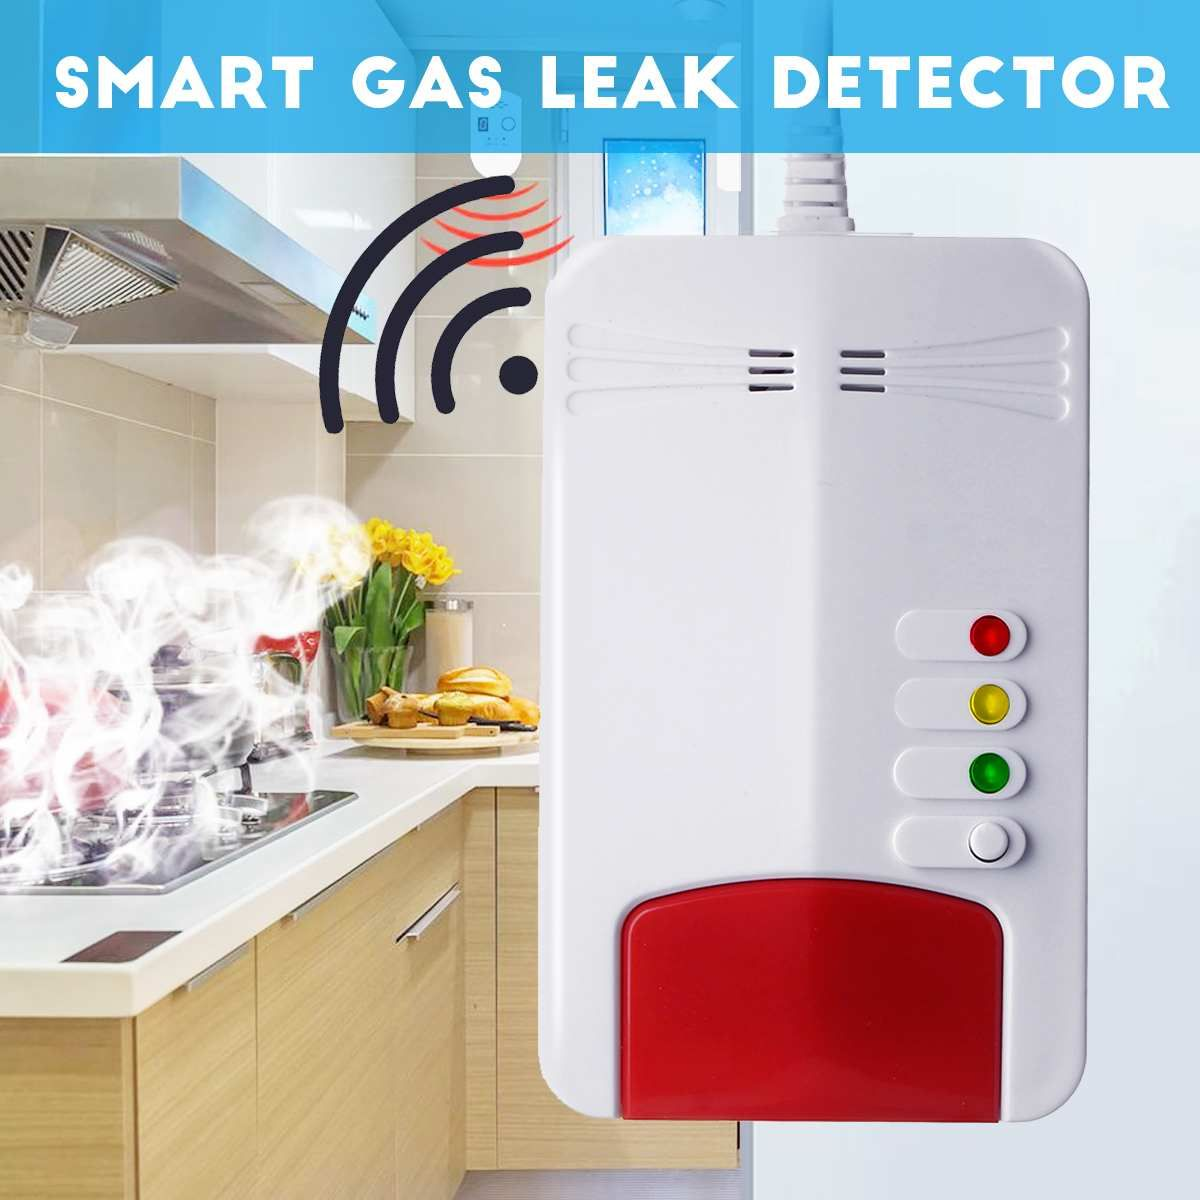 Smart Gas Leck Detektor Natürliche Gas Alarm Sensor Propan Butan Methan Analysator Alarm Warnung Home Security Anzeige Licht